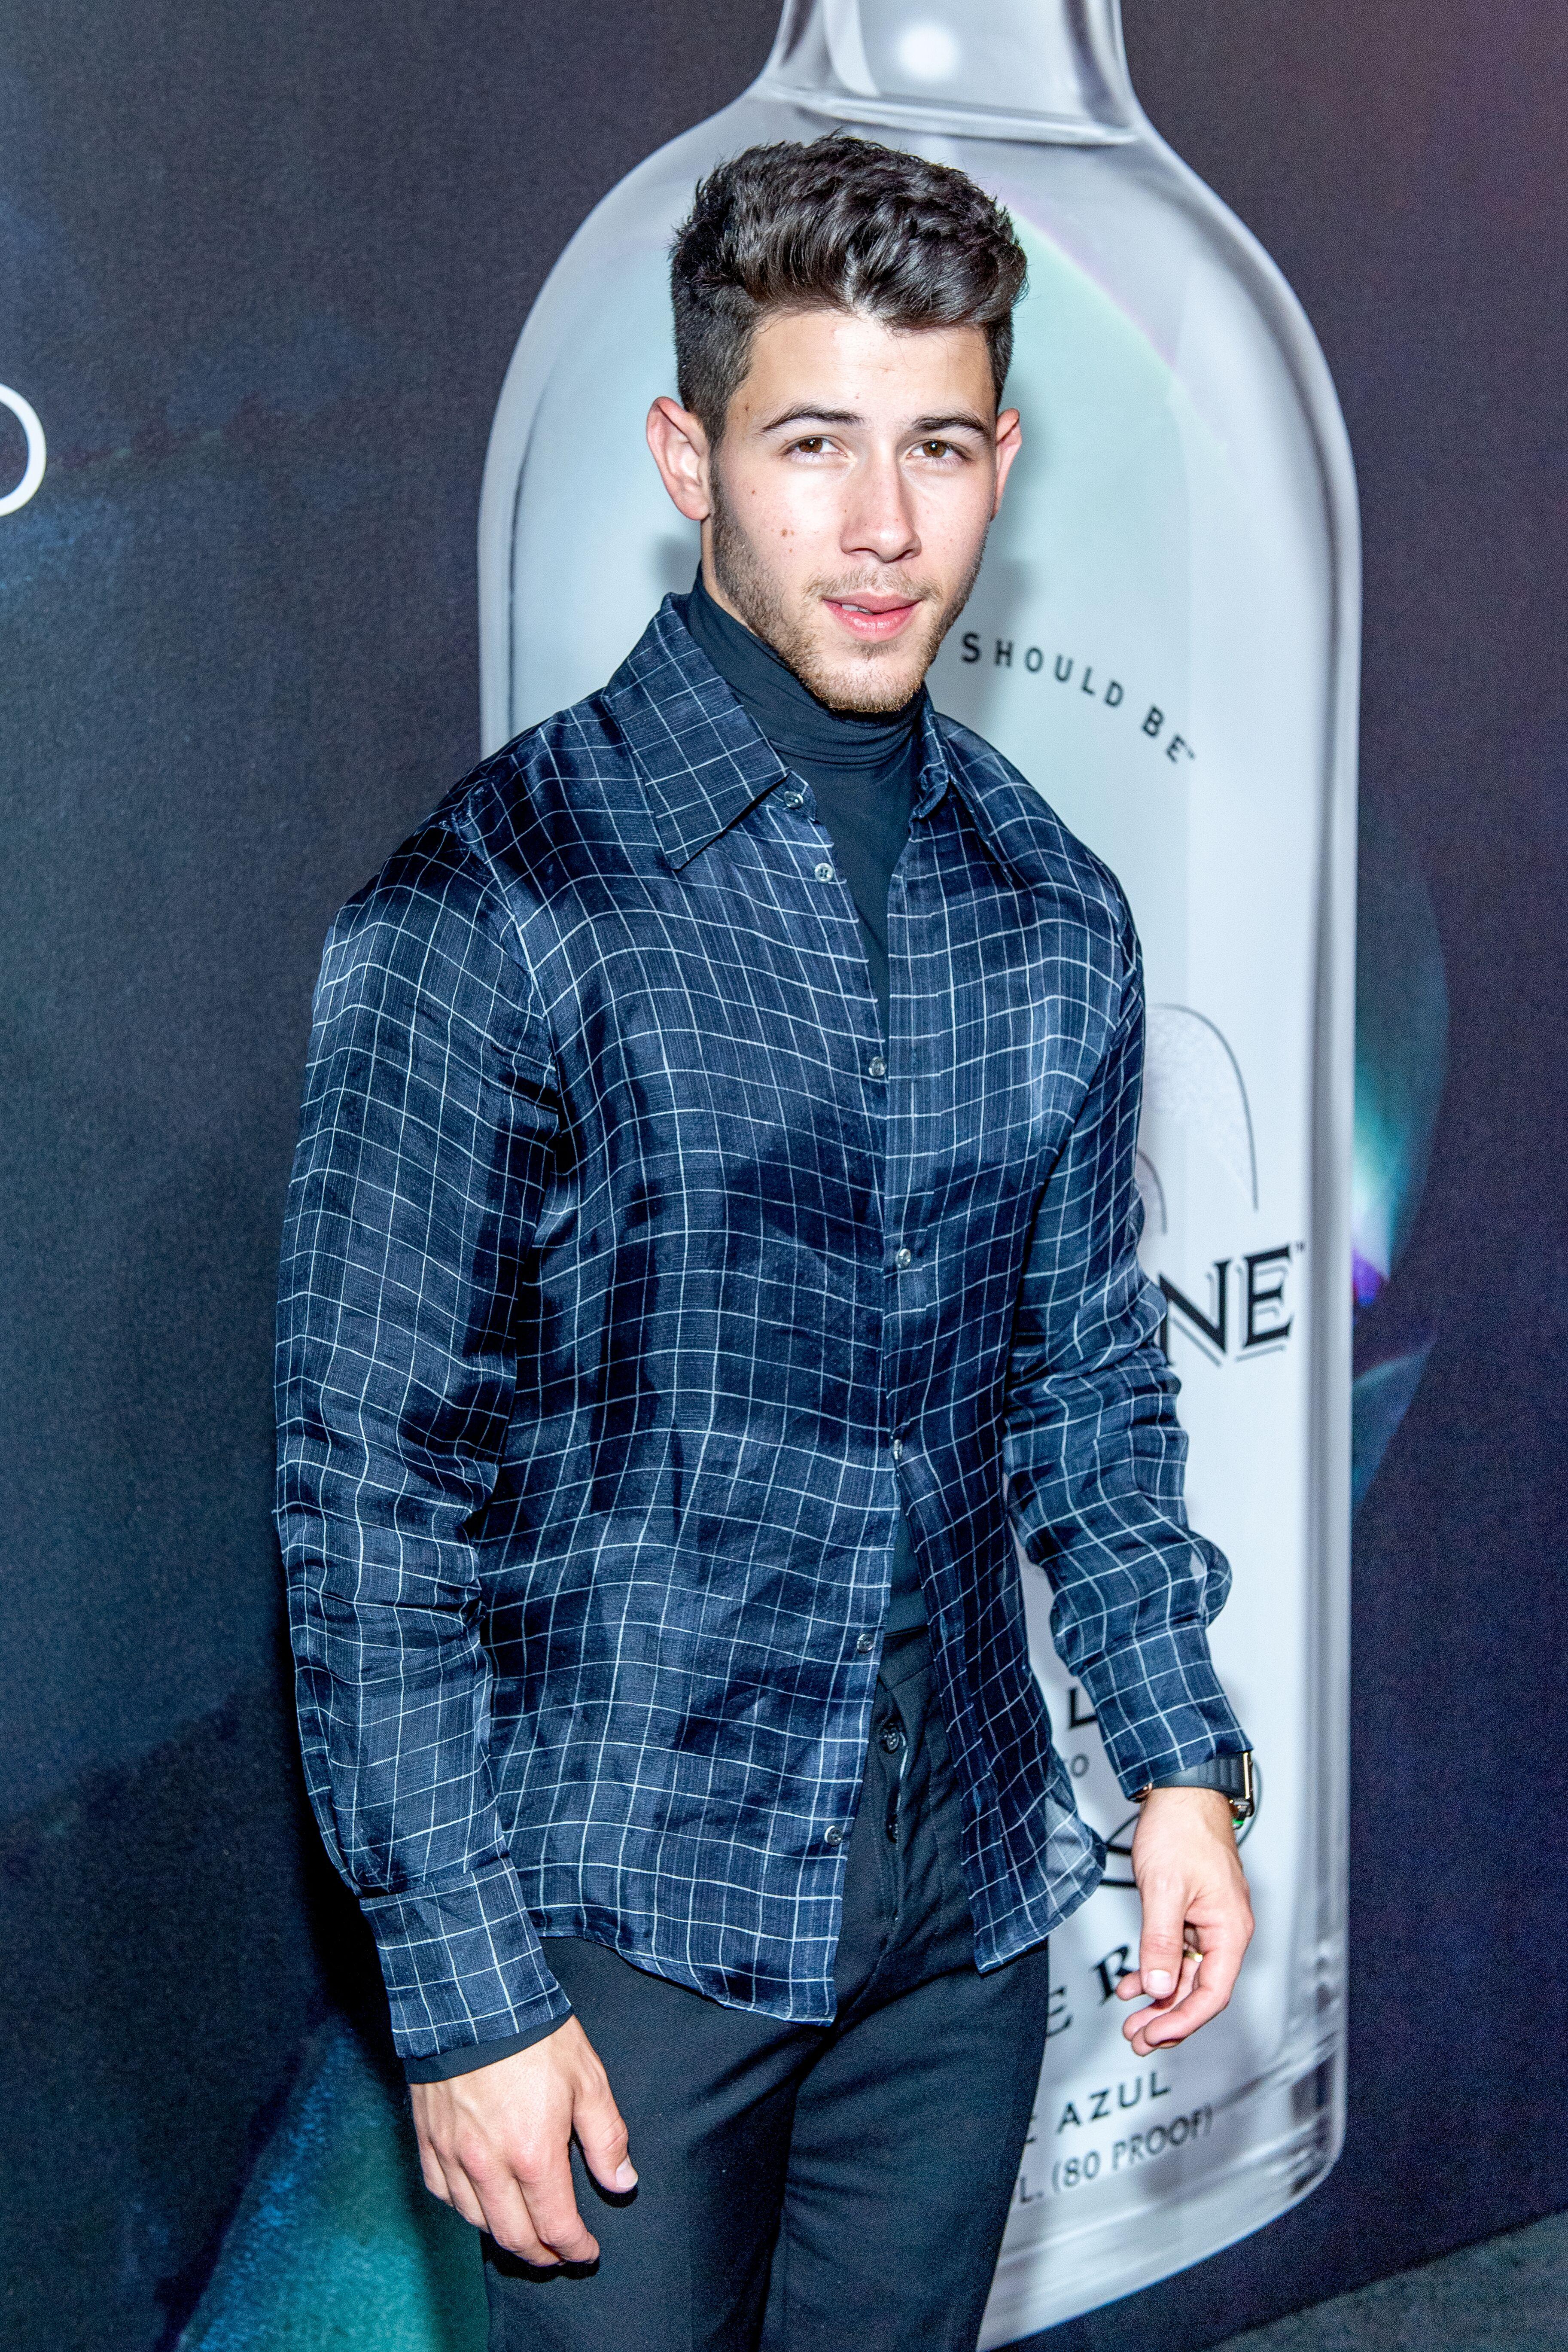 Nick Jonas assiste au lancement de Nick Jonas x John Varvatos Villa One Tequila à John Varvatos Bowery NYC le 29 août 2019 à New York City | Source : Getty Images